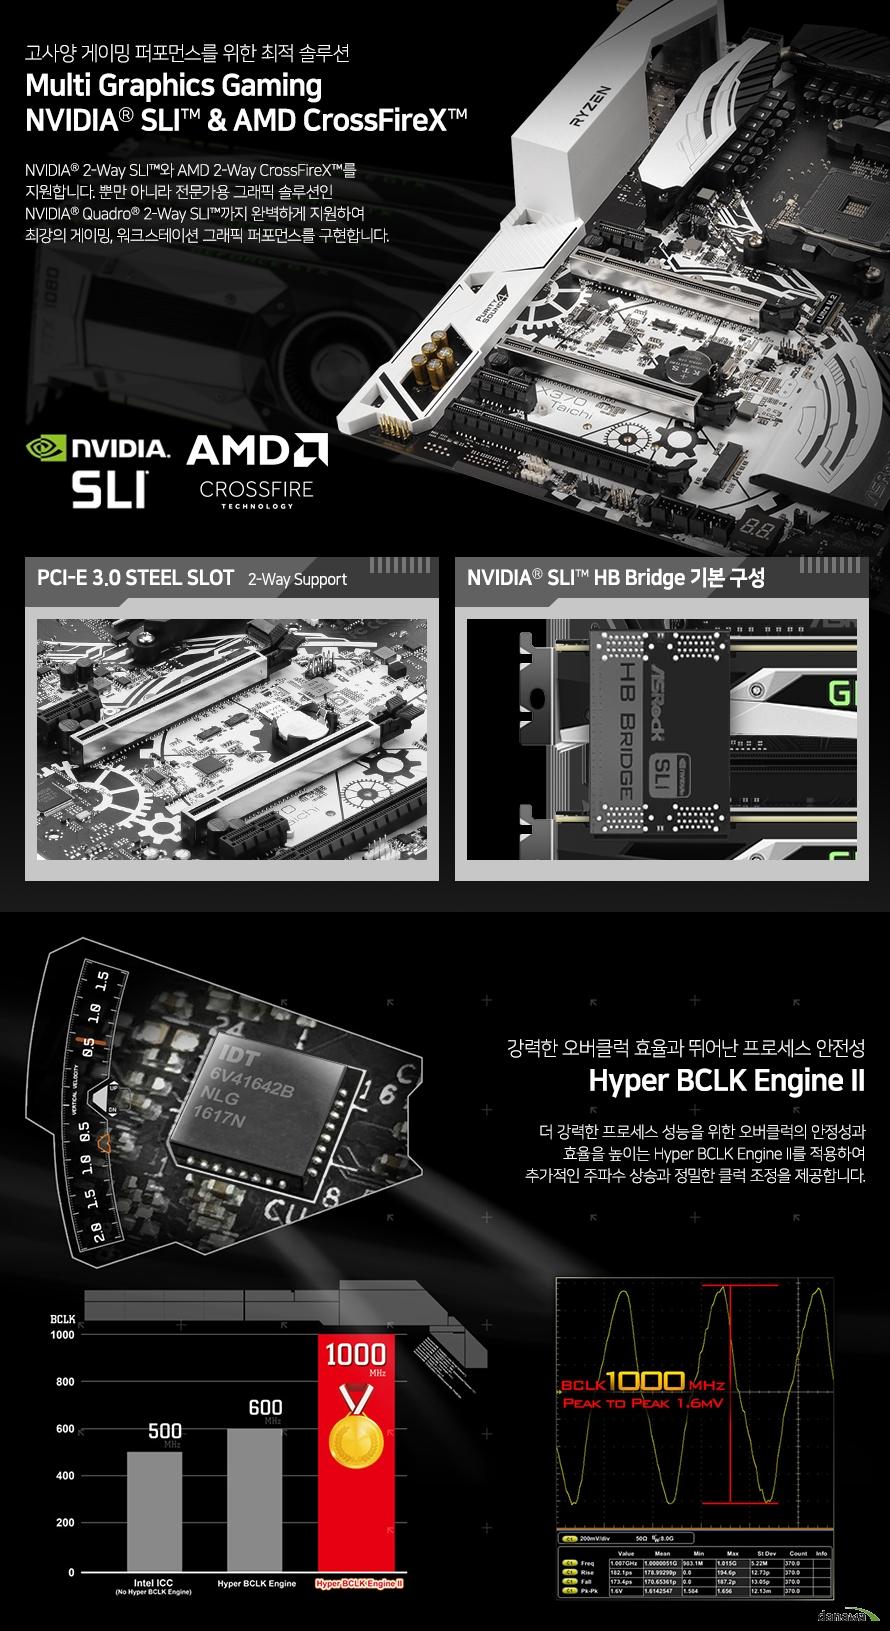 NVIDIA 2-Way SLI와 AMD 2-Way CrossFireX를 지원합니다. 뿐만 아니라 전문가용 그래픽 솔루션인 NVIDIA Quadro 2-Way SLI까지 완벽하게 지원하여 최강의 게이밍, 워크스테이션 그래픽 퍼포먼스를 구현합니다. 더 강력한 프로세스 성능을 위한 오버클럭의 안정성과 효율을 높이는 Hyper BCLK Engine II를 적용하여 추가적인 주파수 상승과 정밀한 클럭 조정을 제공합니다.